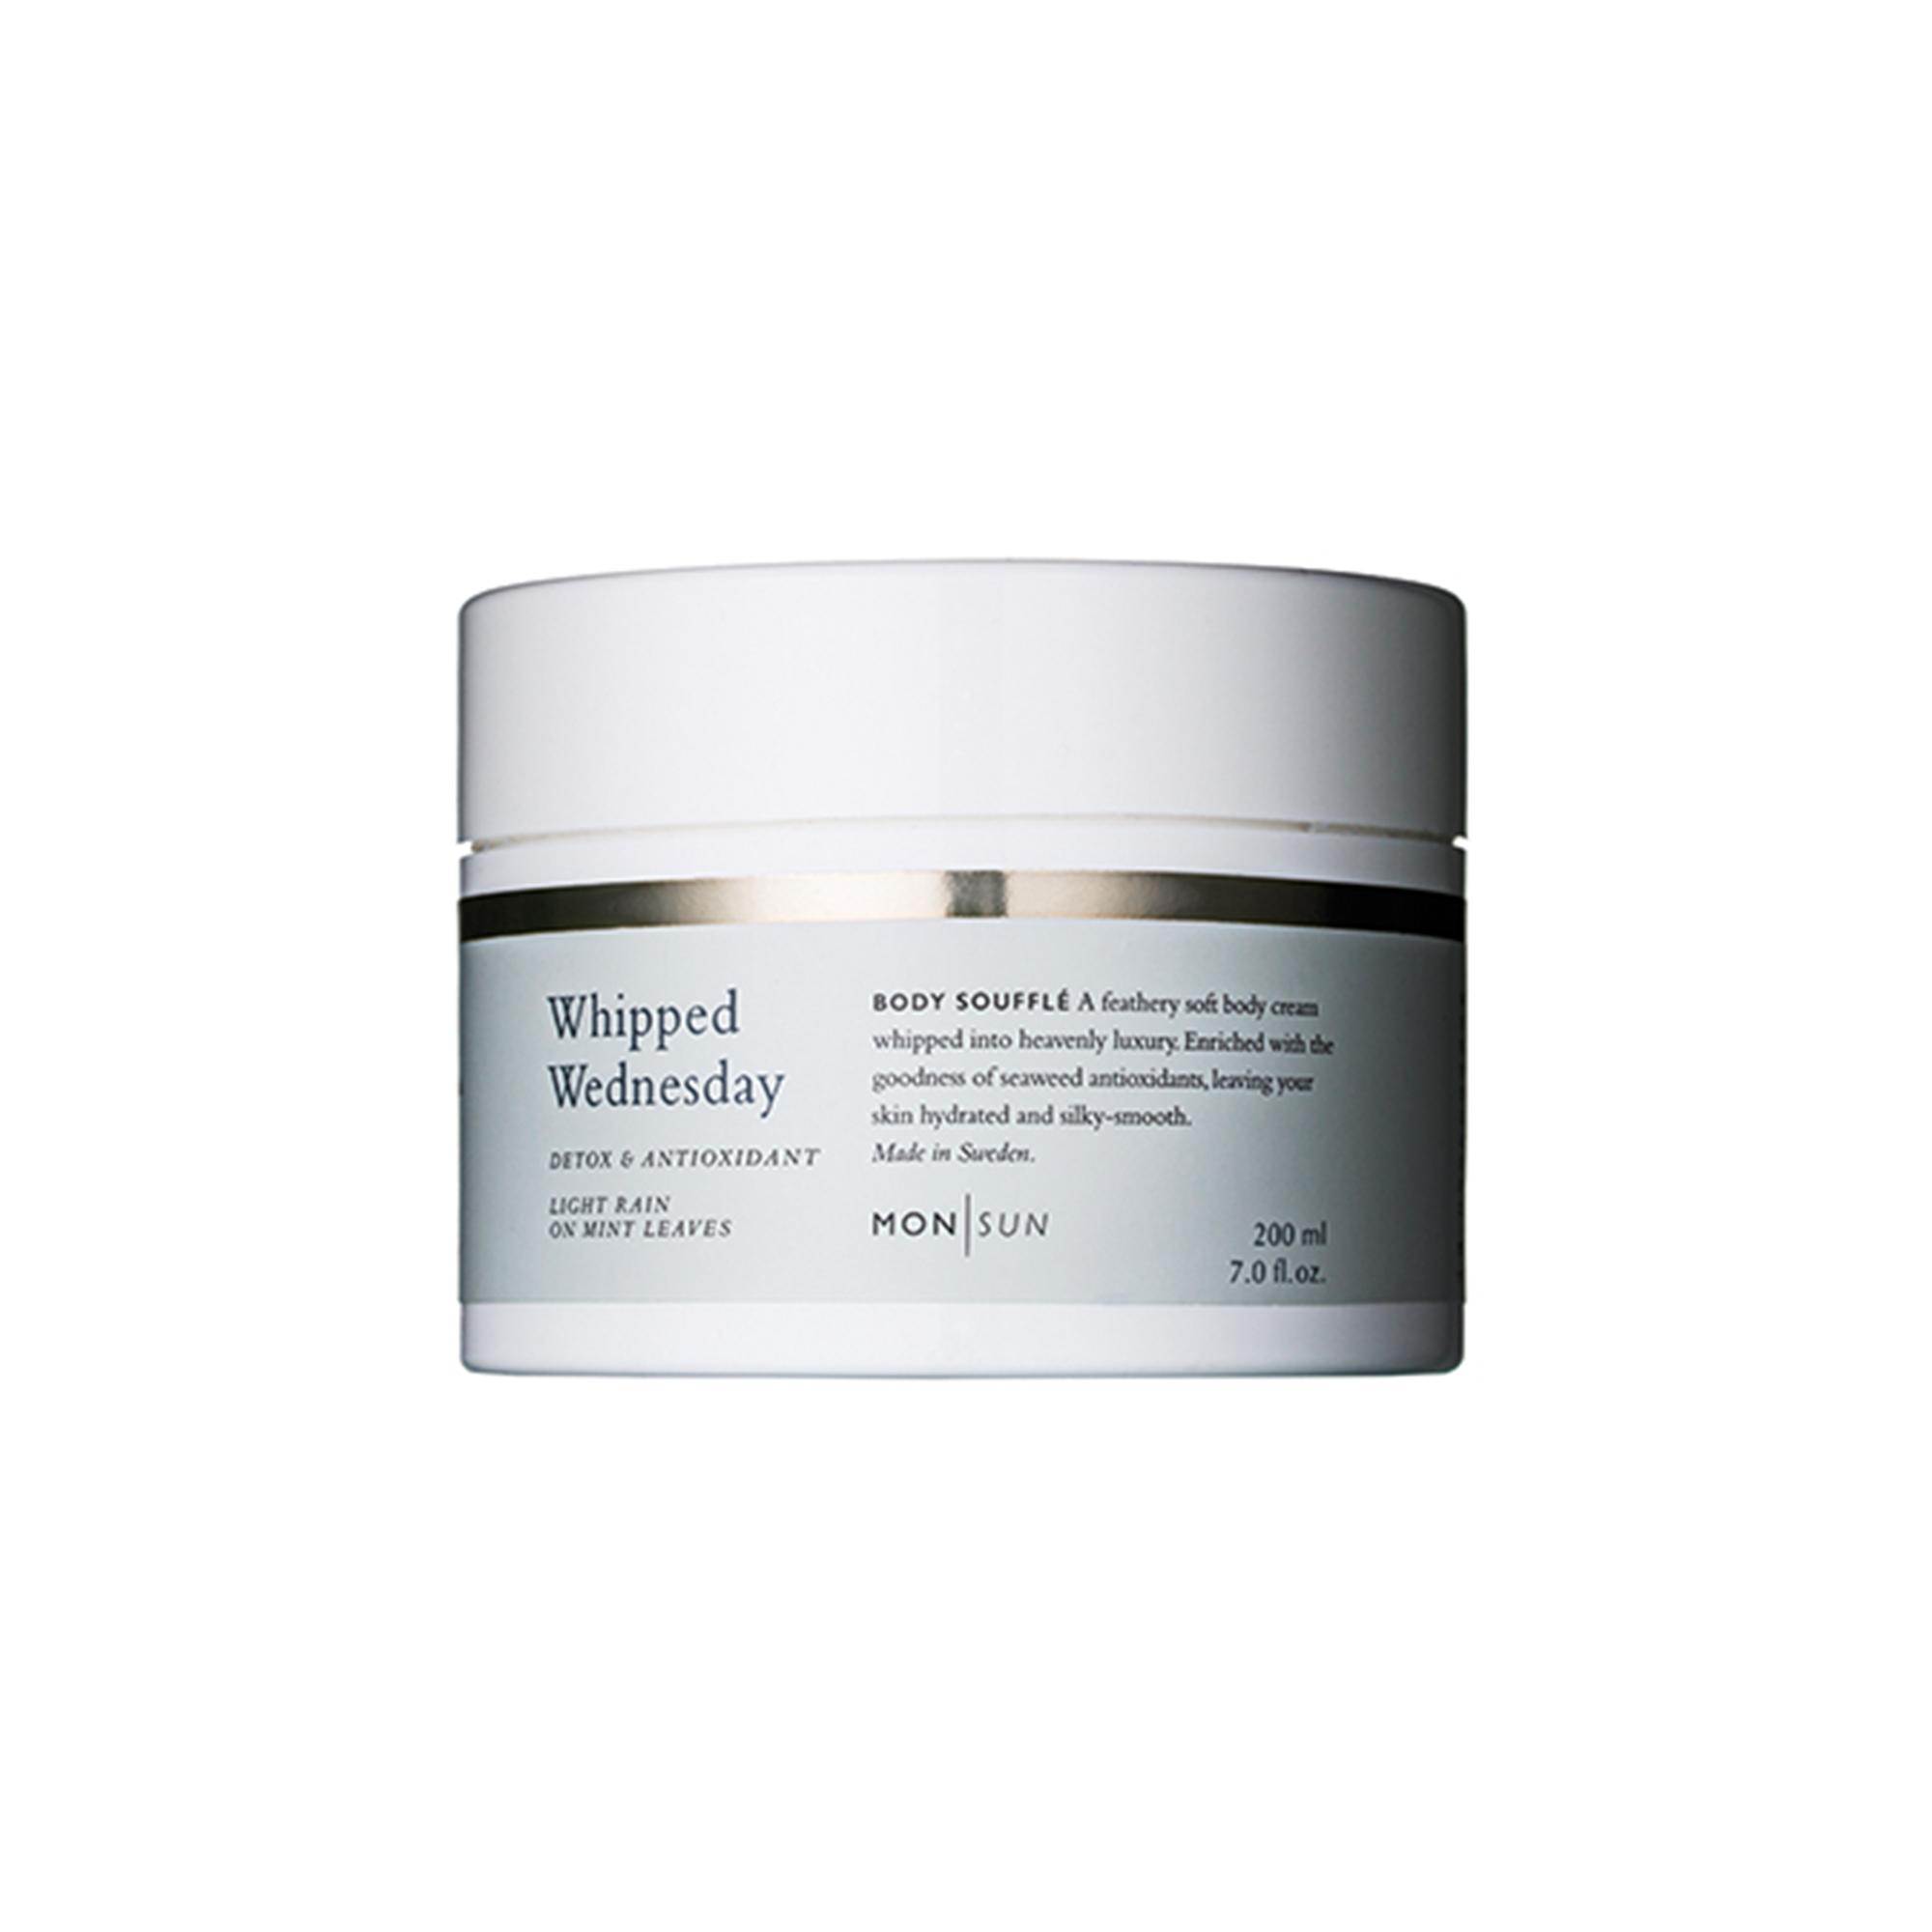 Whipped Wednesday Detox & Antioxidant Body Soufflé 200ml